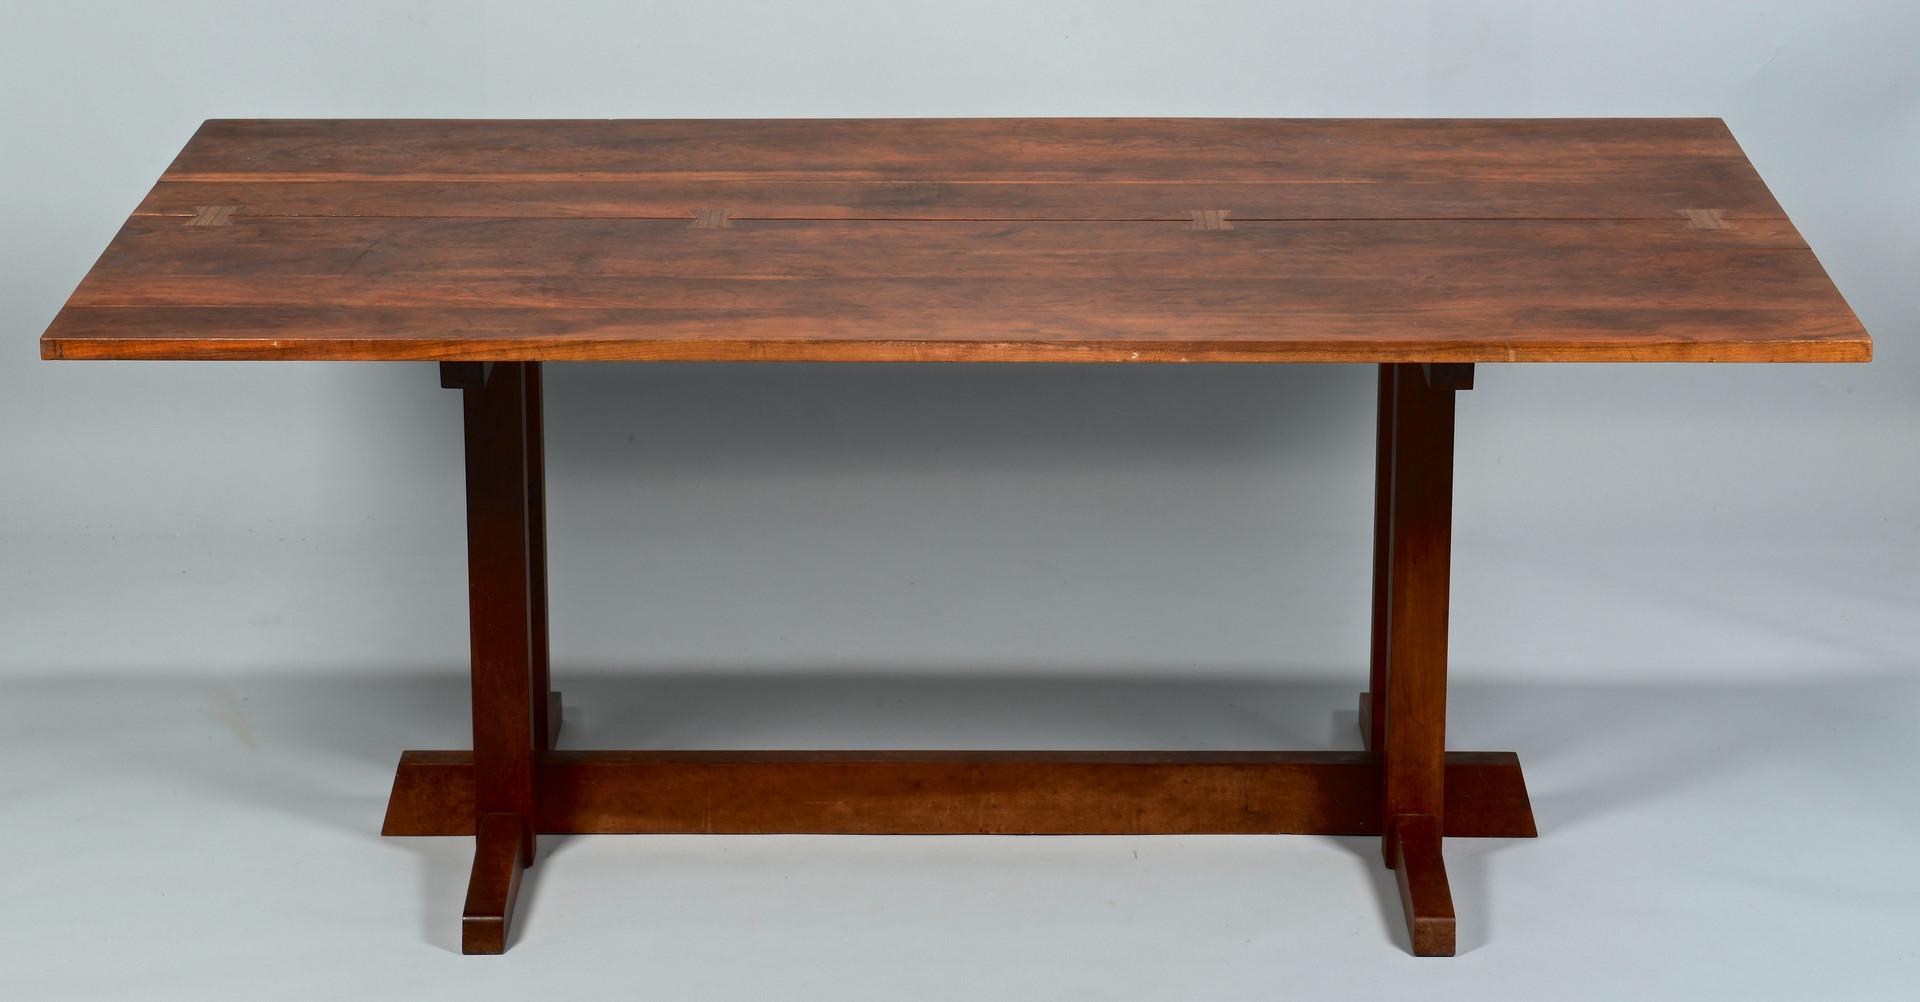 Lot 522: George Nakashima Frenchman's Cove Table